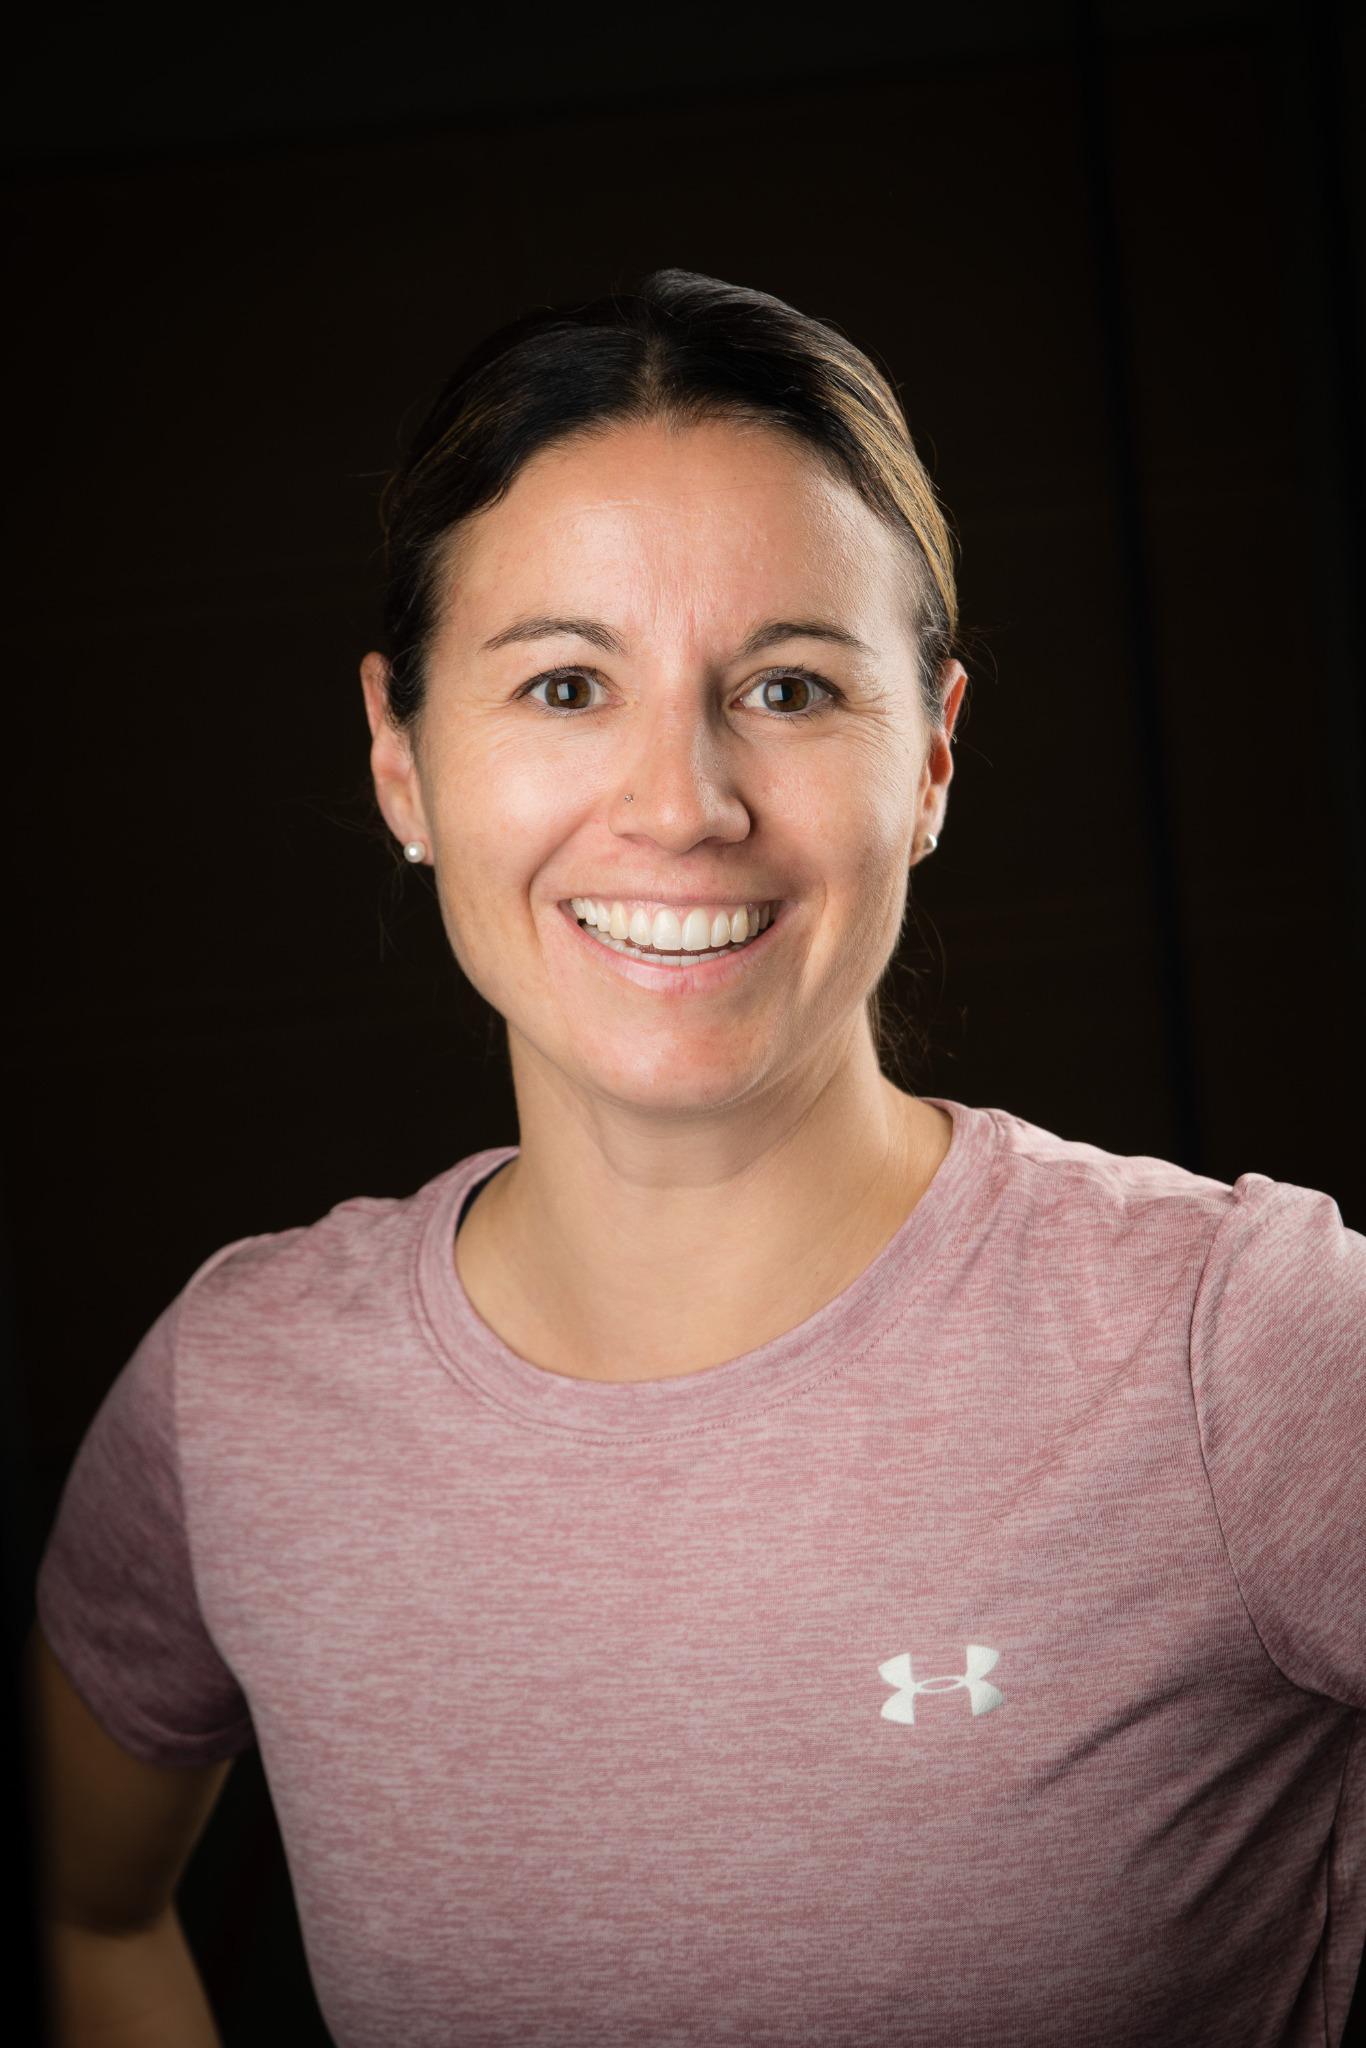 Daniela Burgstaller